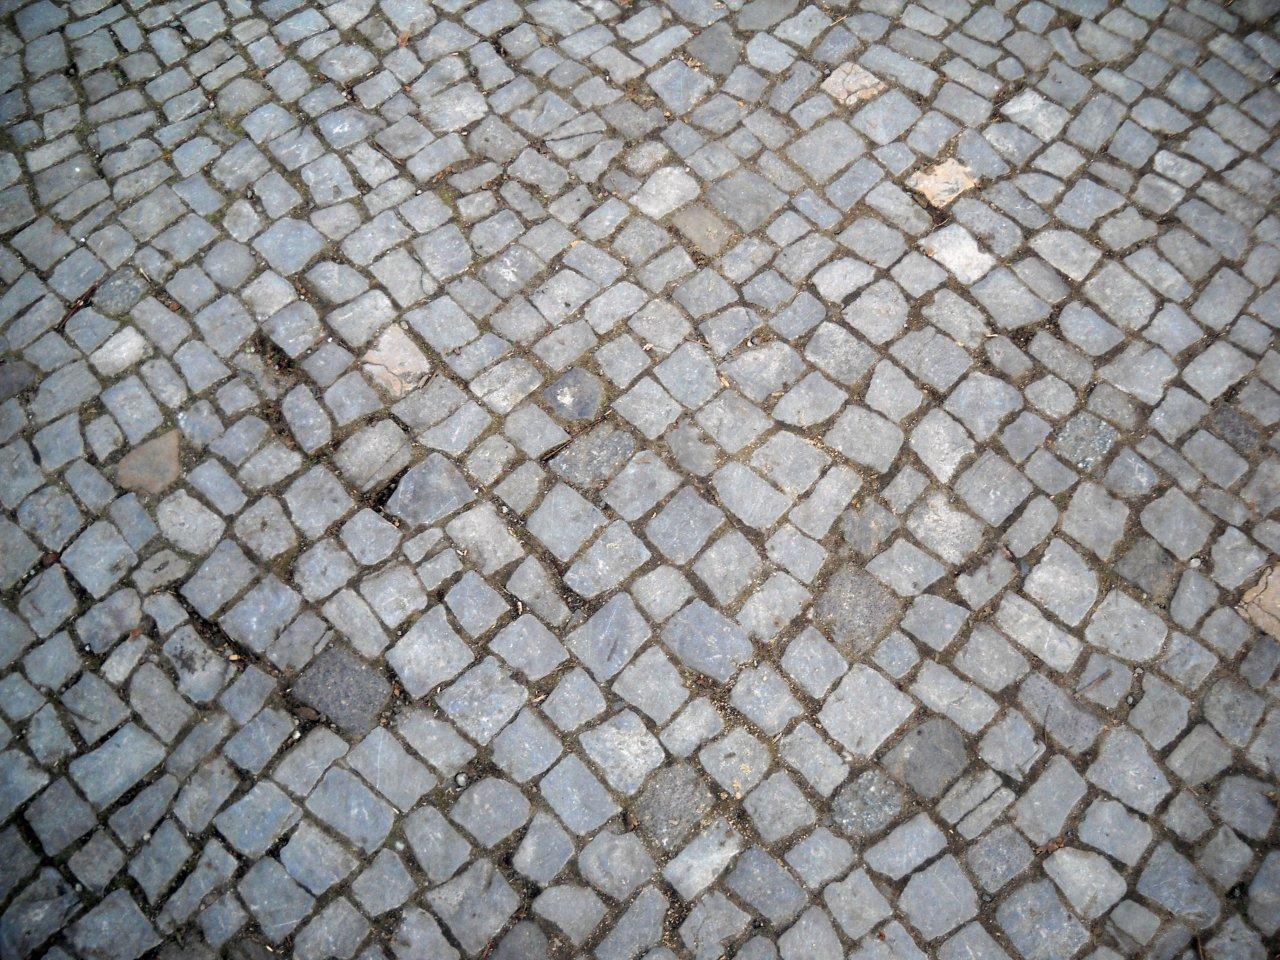 berlin-sidewalk.thumb.jpg.ef21dc5450846a9a611f3cc6e7496c76.jpg